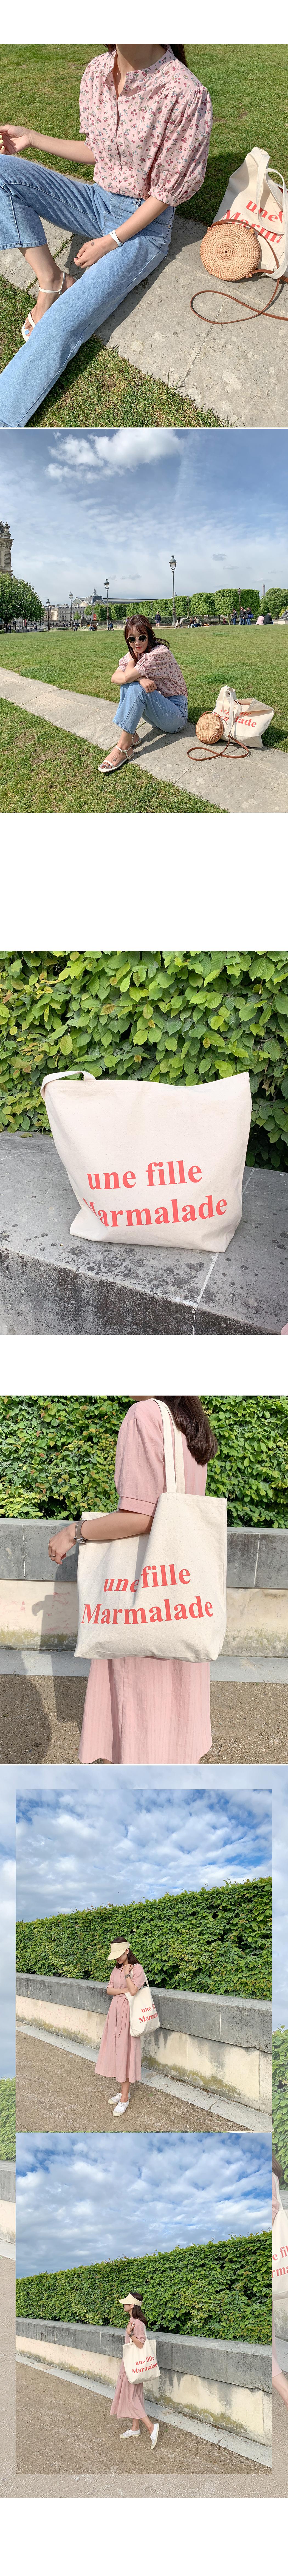 Marmalade♥.Une Fille eco bag